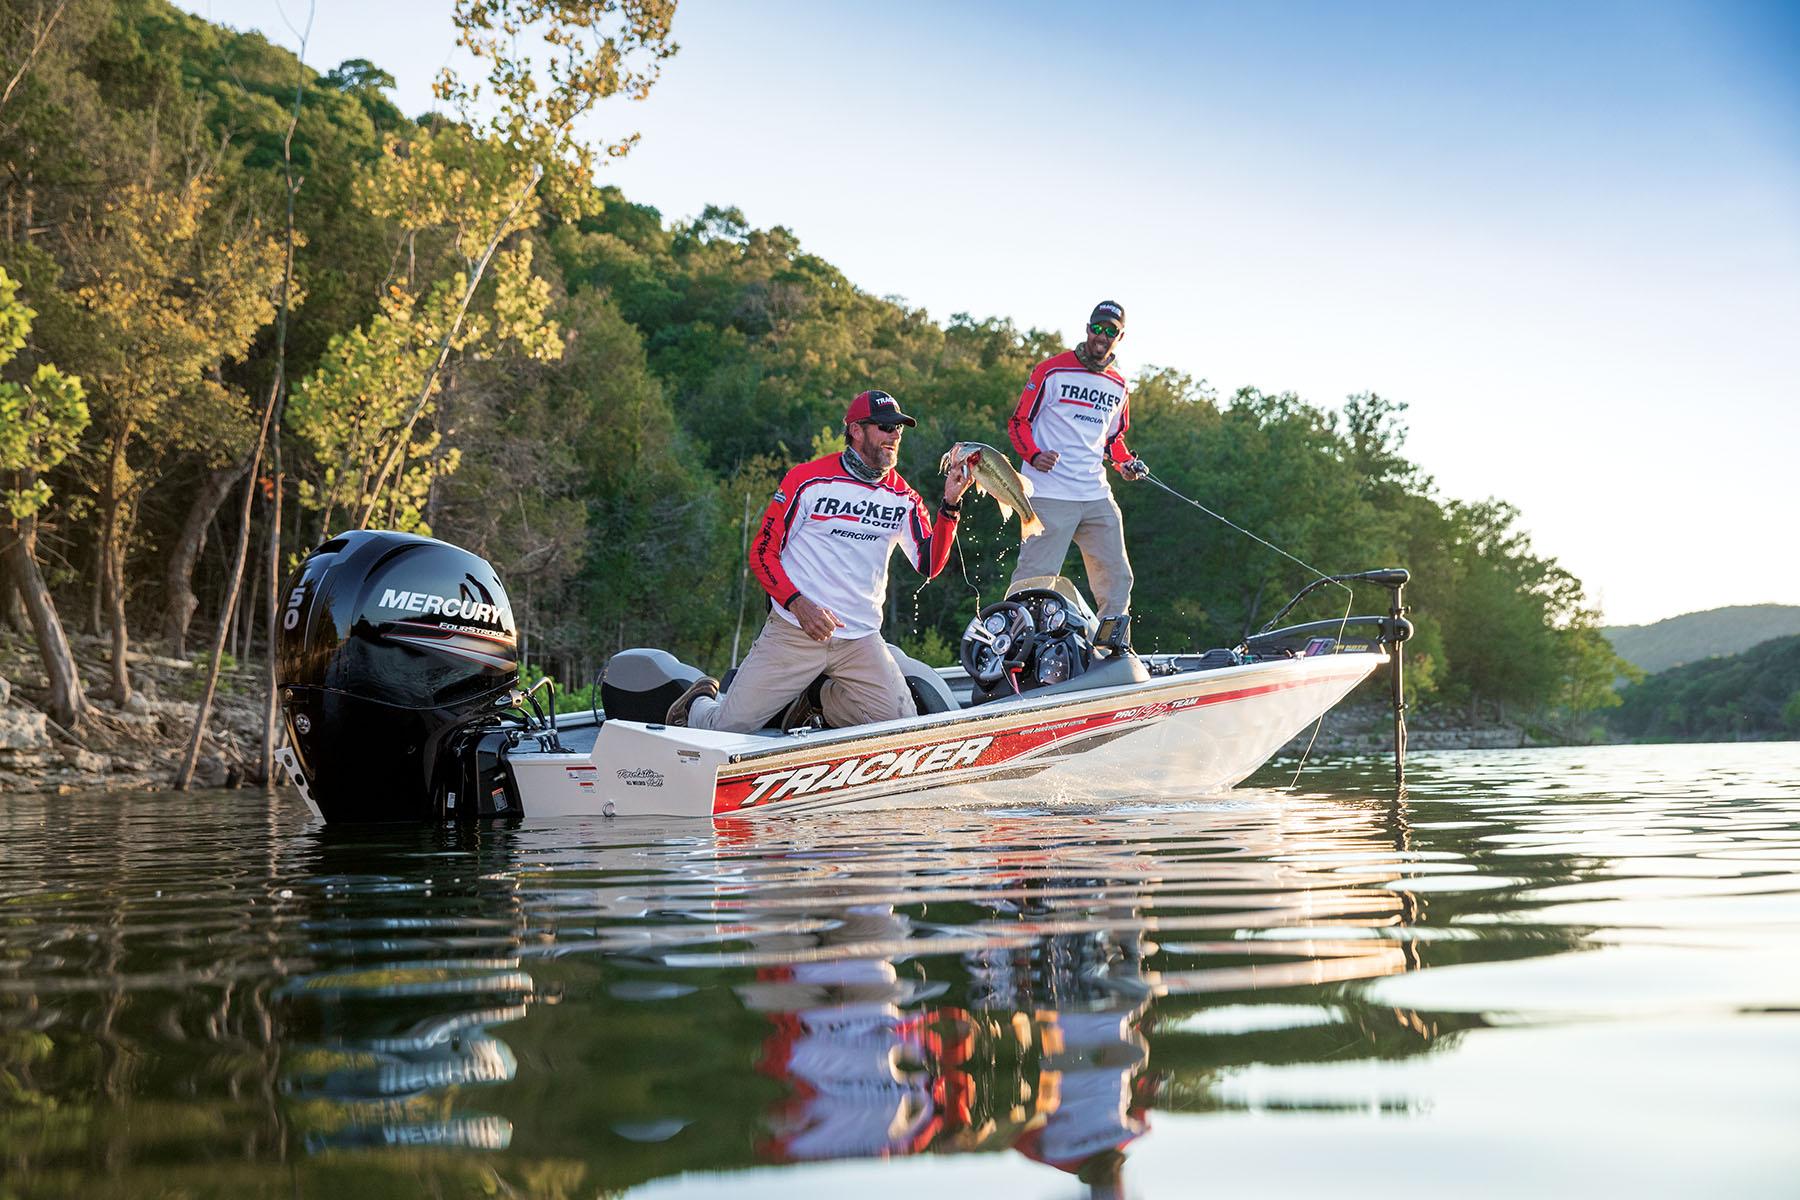 2019 Tracker Fishing Boat